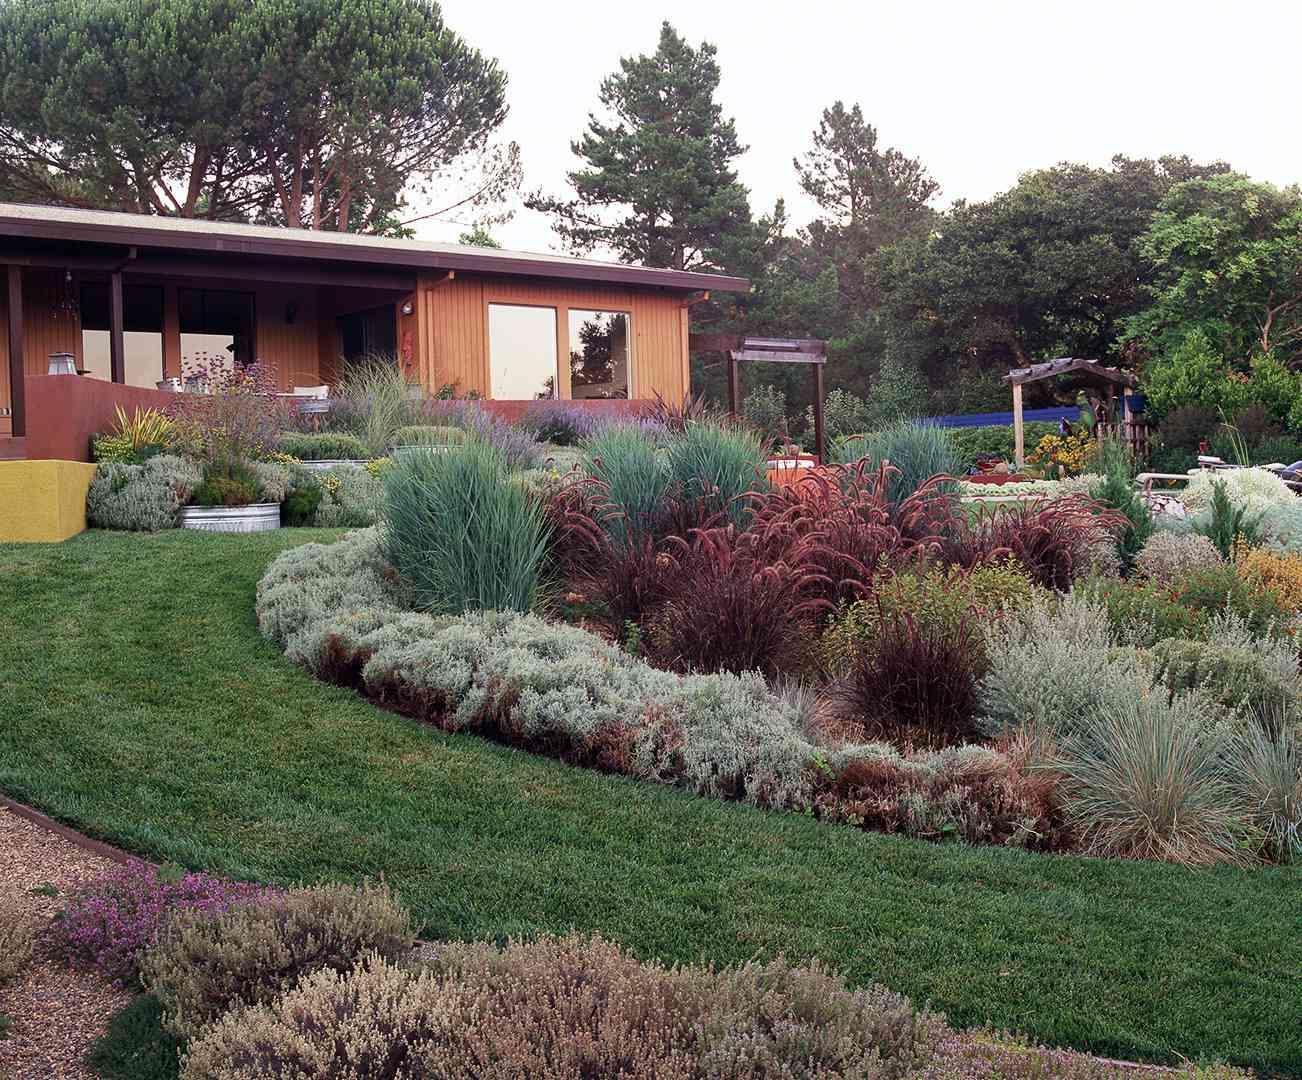 Easy Landscaping Ideas | Better Homes & Gardens on Easy Back Garden Ideas id=43164